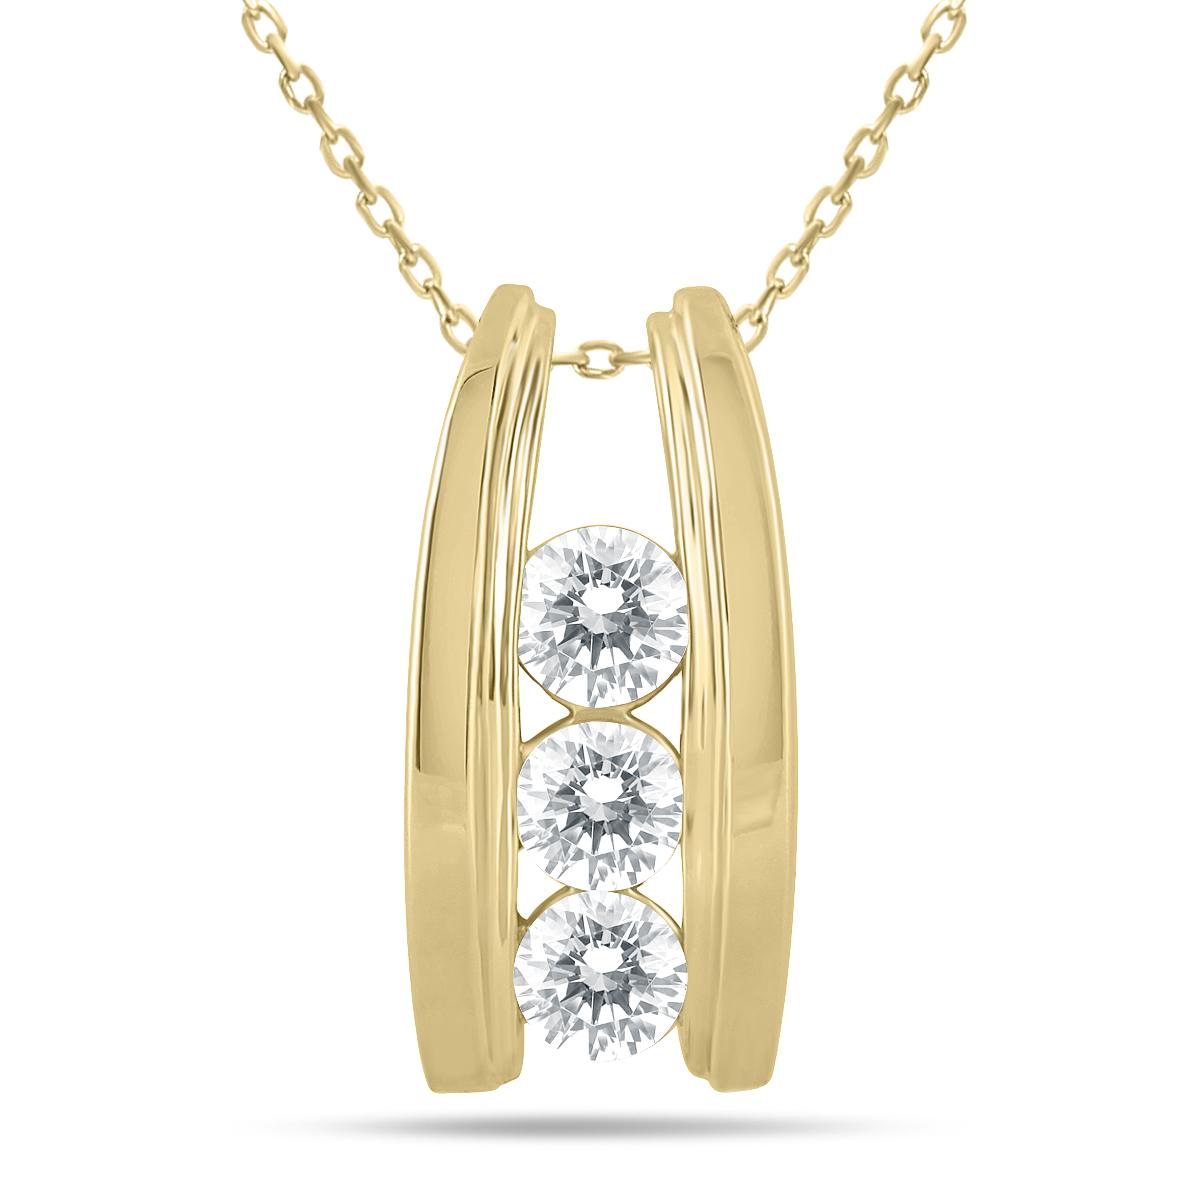 1 Carat TW Bar Set Three Stone Diamond Pendant in 14k Yellow Gold